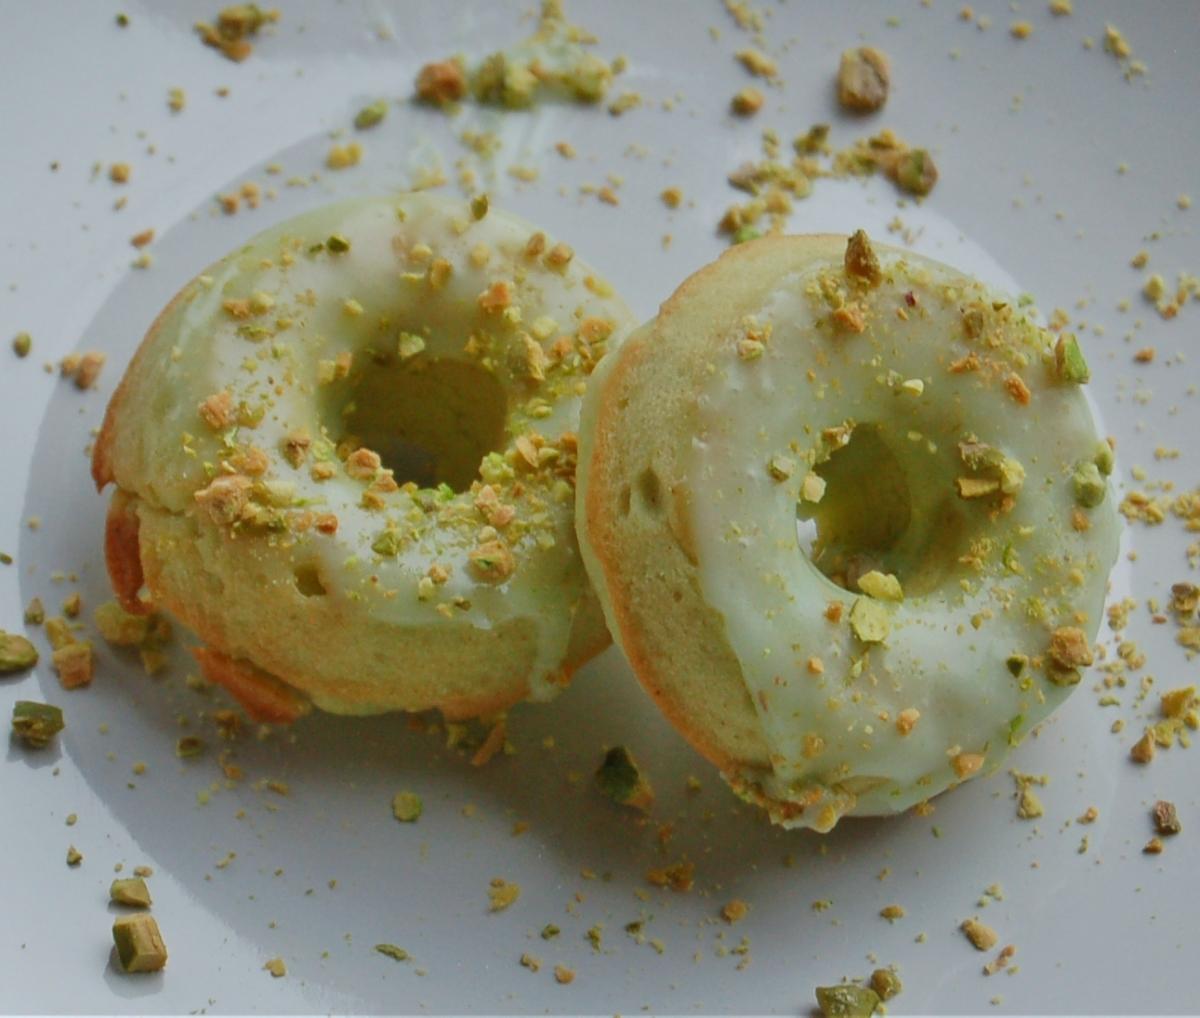 Baked Glazed Pistachio Donuts